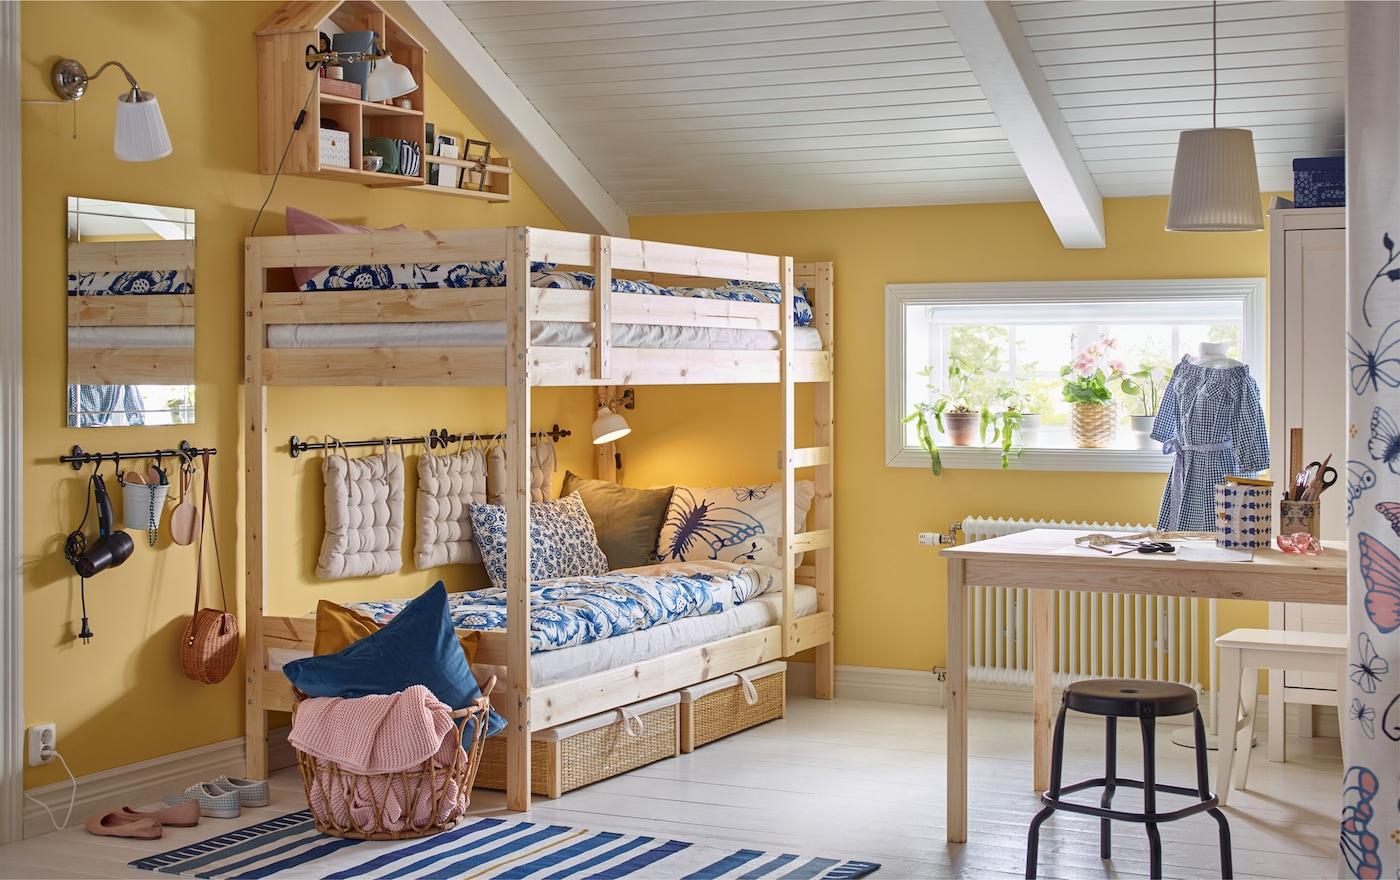 A Small Shared Bedroom With Big Ideas Ikea Malaysia Ikea